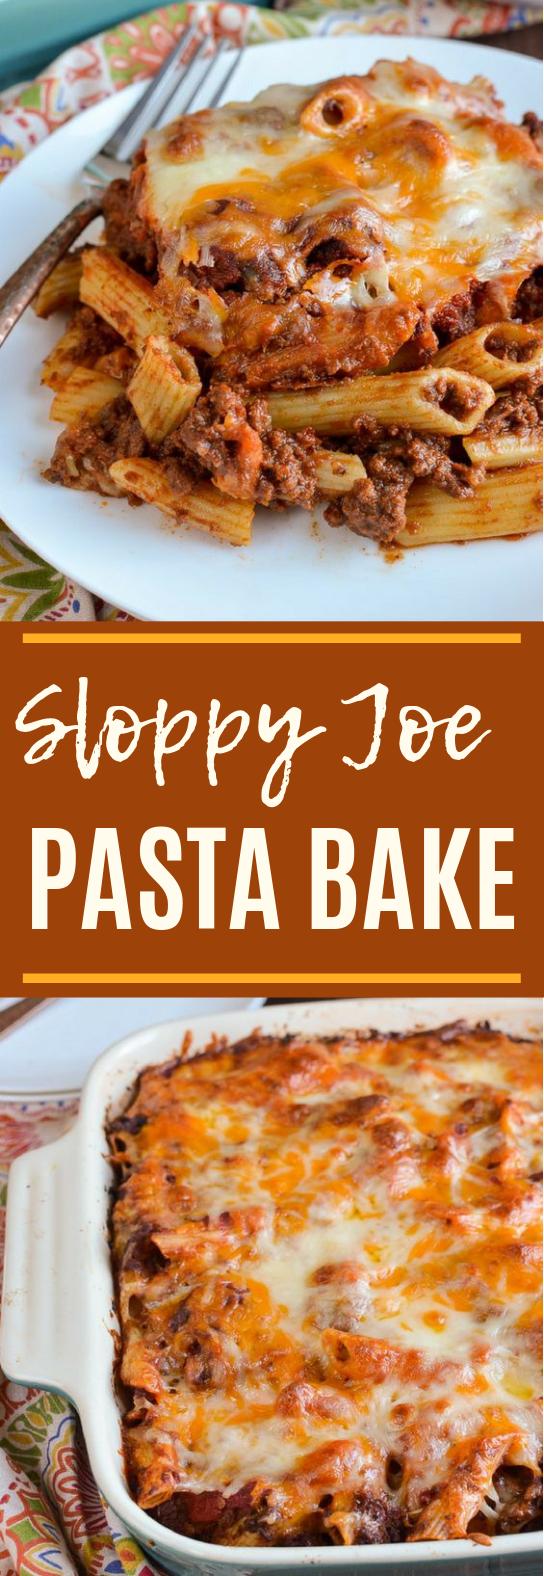 Sloppy Joe Pasta Bake #dinner #pasta